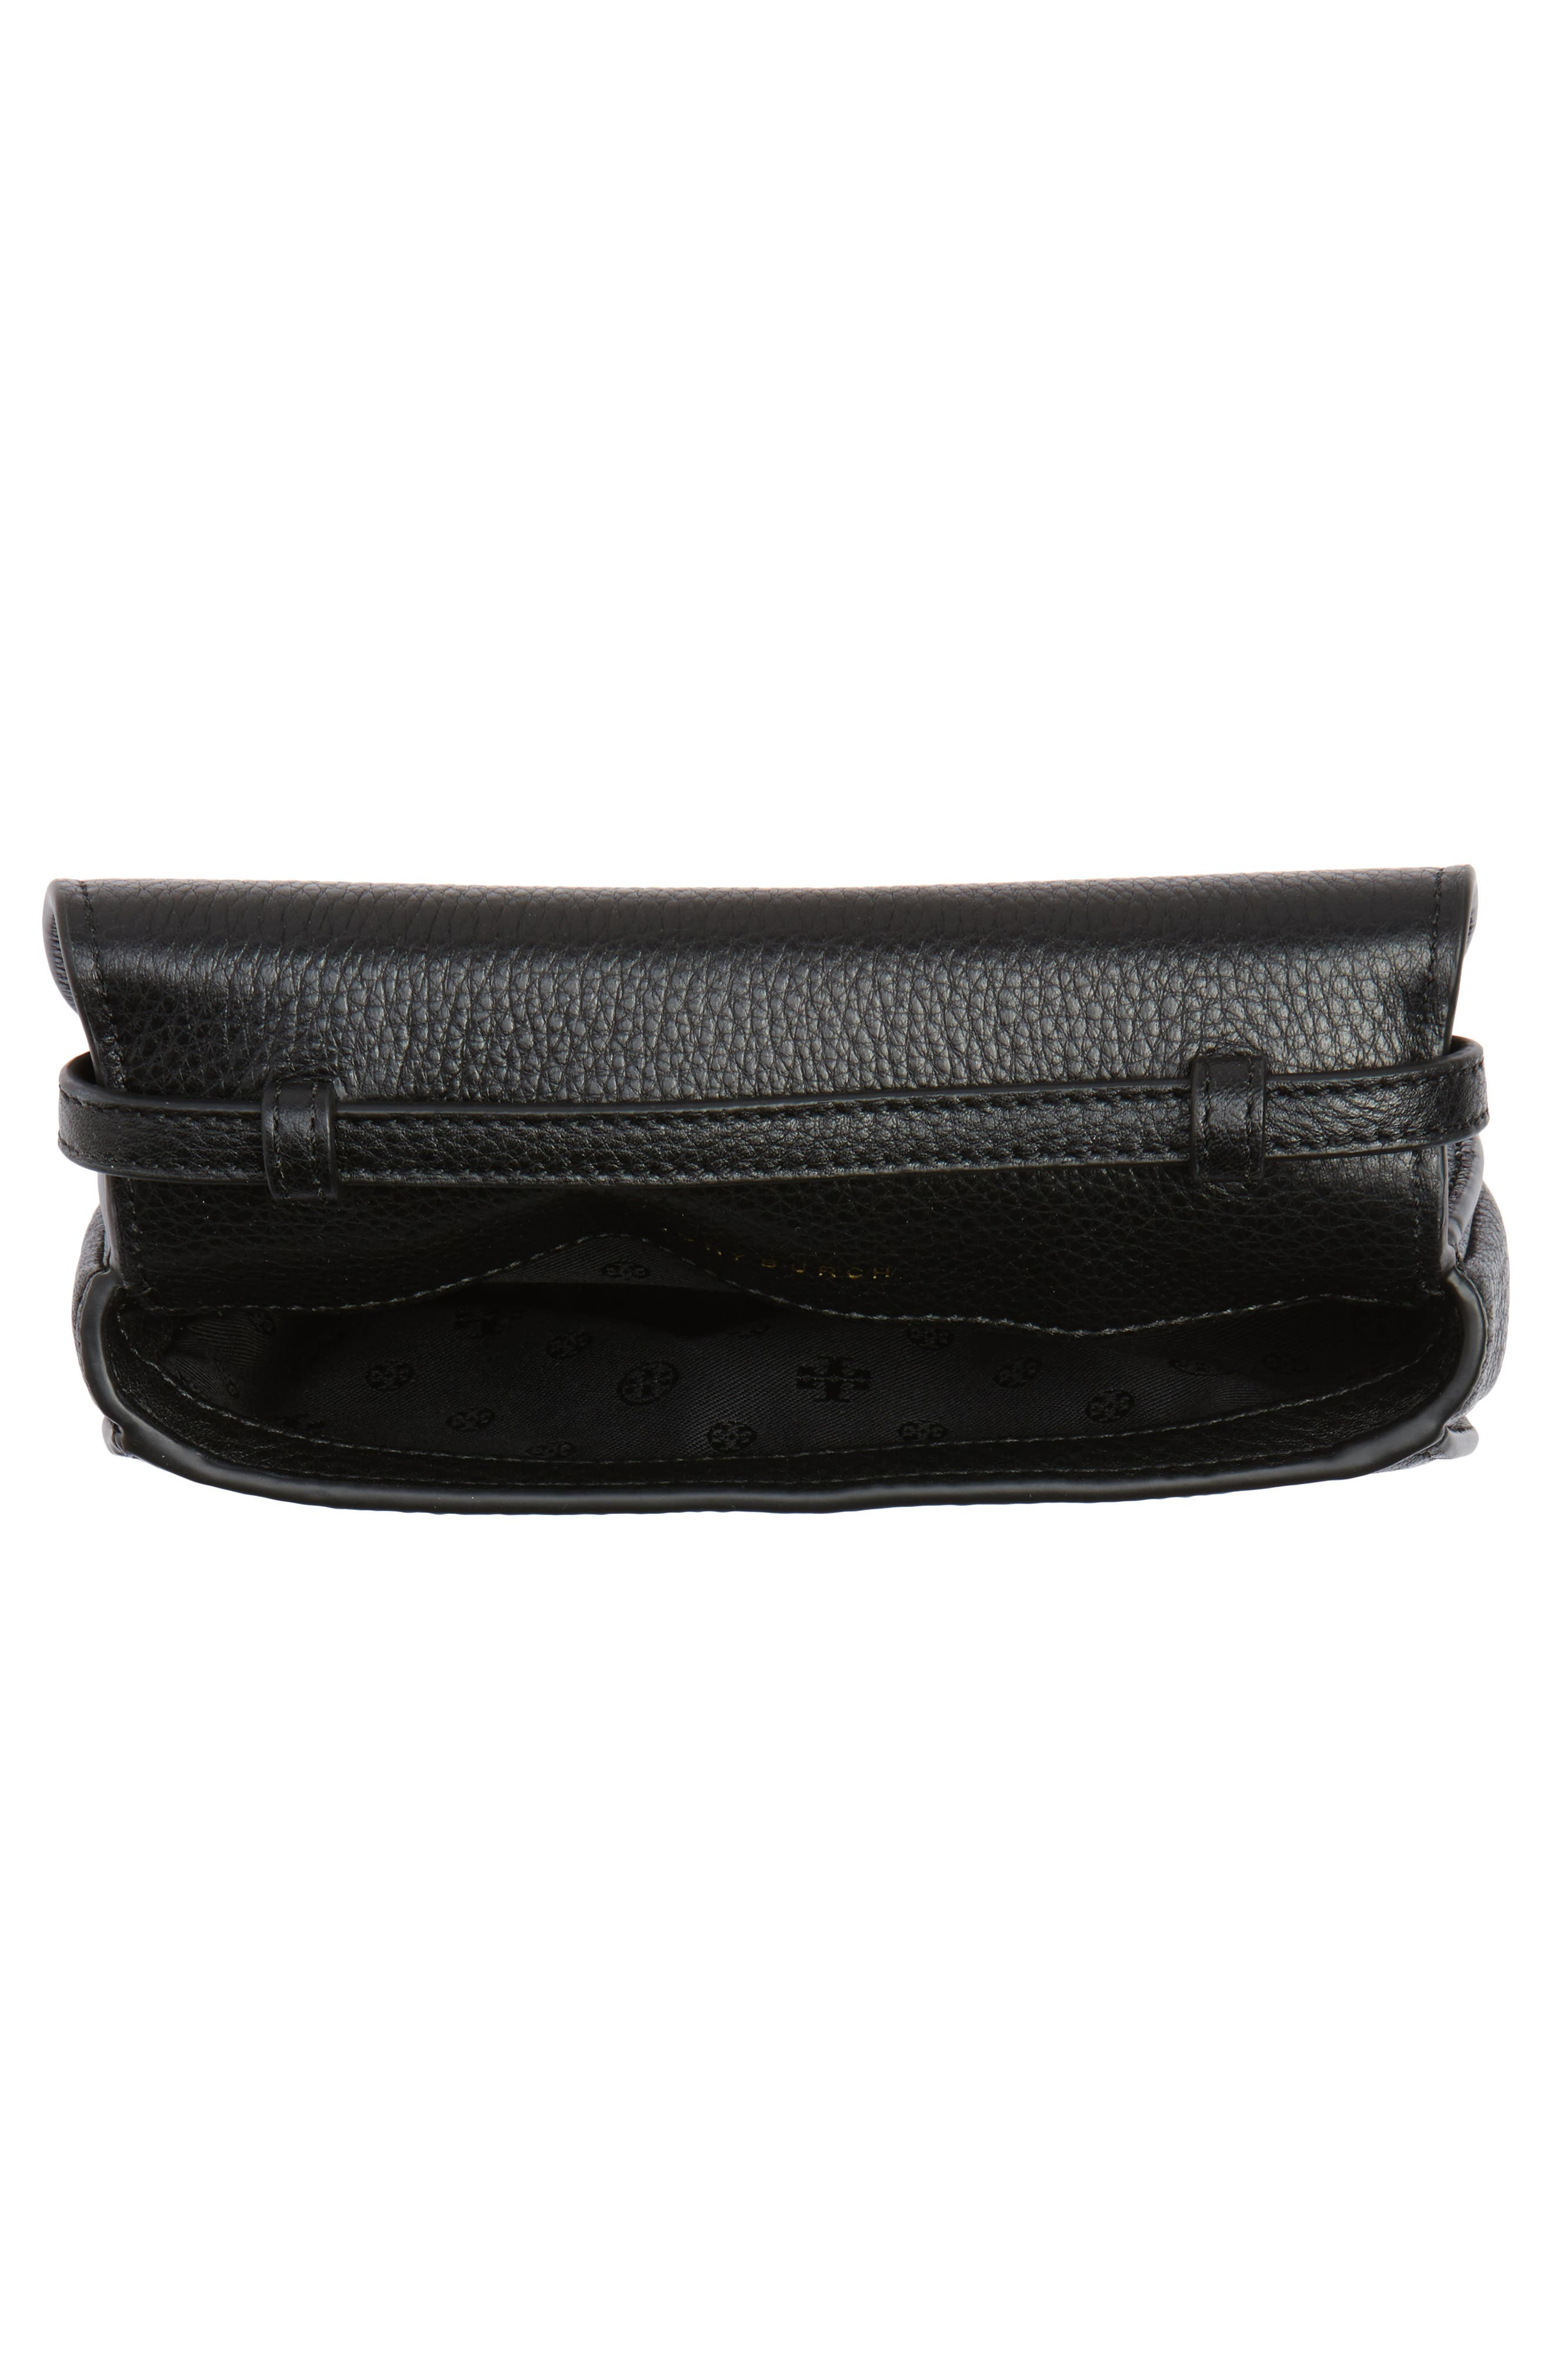 Mini Jamie Leather Crossbody Bag,                             Alternate thumbnail 4, color,                             001